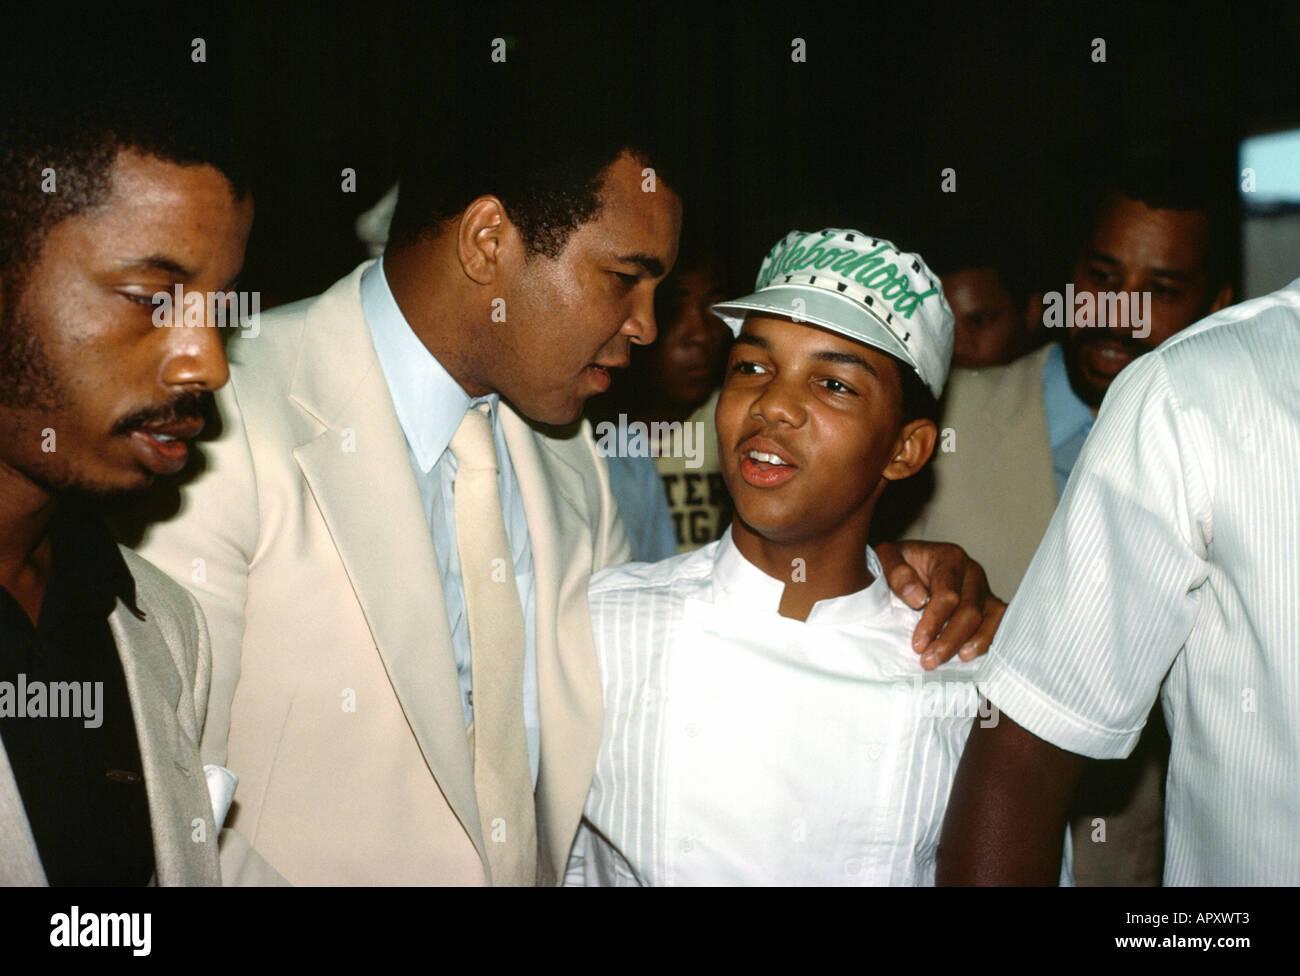 USA Muhammad Ali With Arm Around Boy - Stock Image